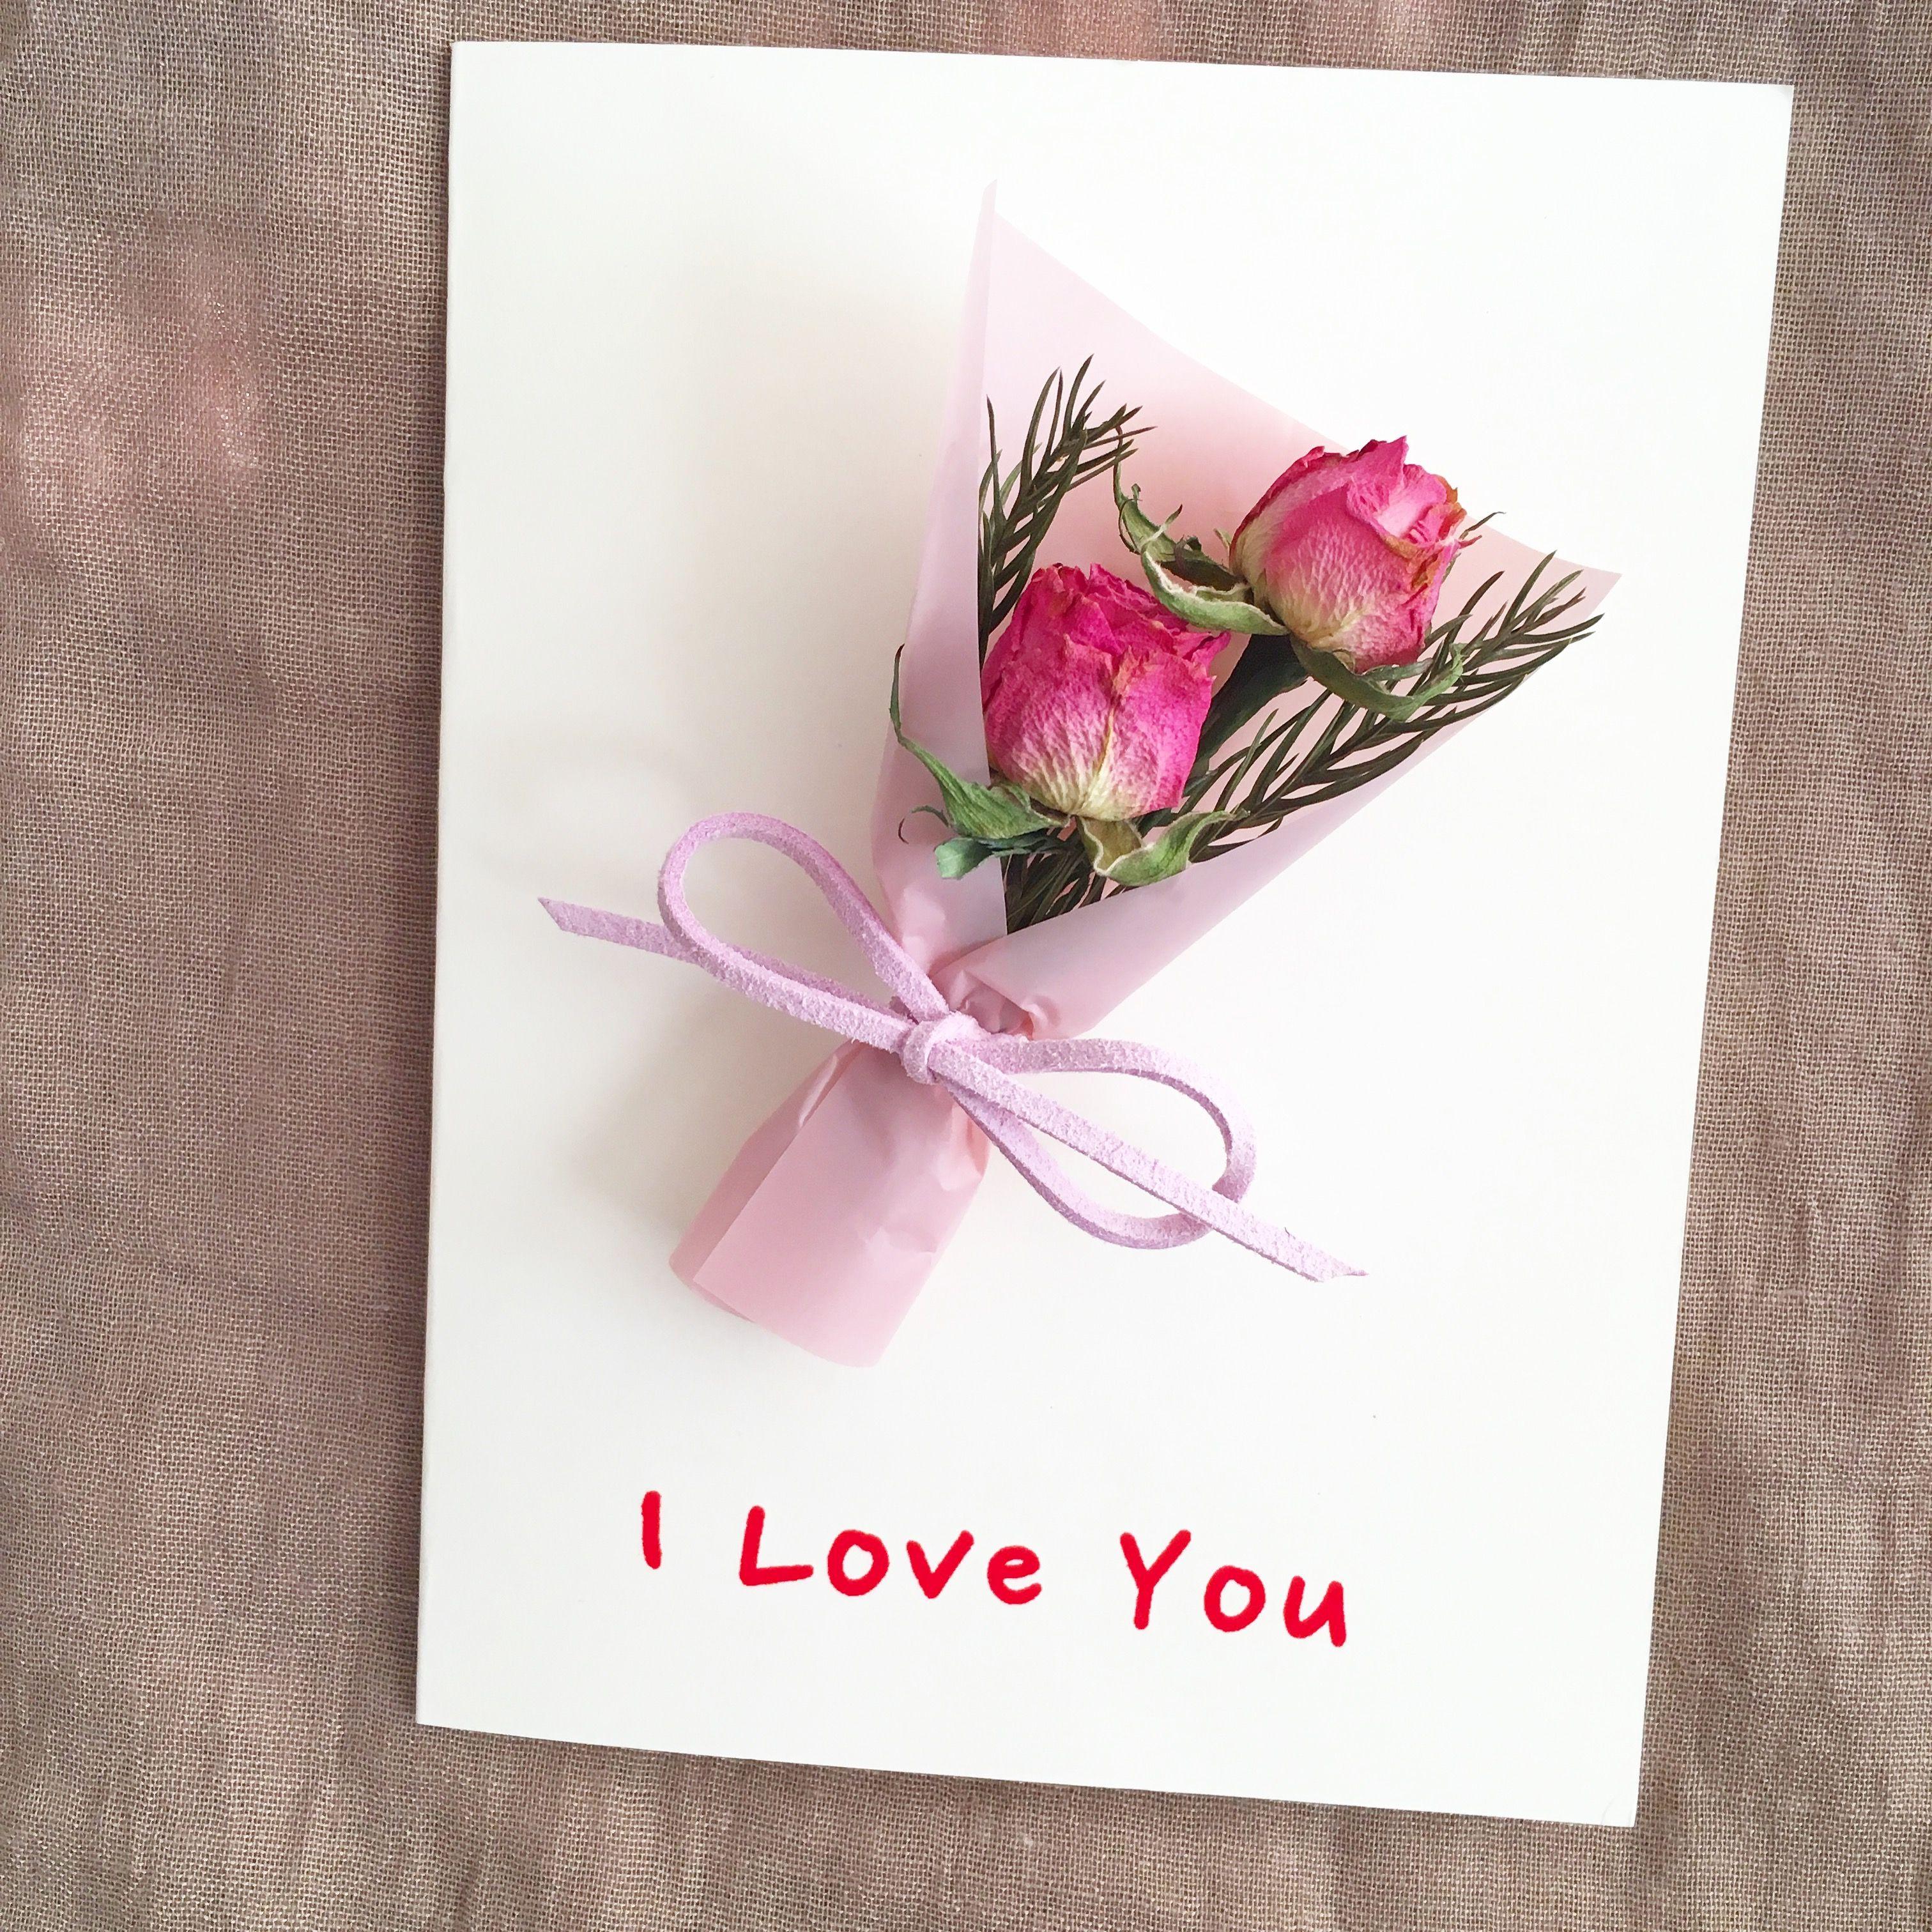 Greeting cardhandmade dried flower card with small roses bouquet greeting cardhandmade dried flower card with small roses bouquet design blank card birthday cardwedding invitationanniversary card izmirmasajfo Gallery